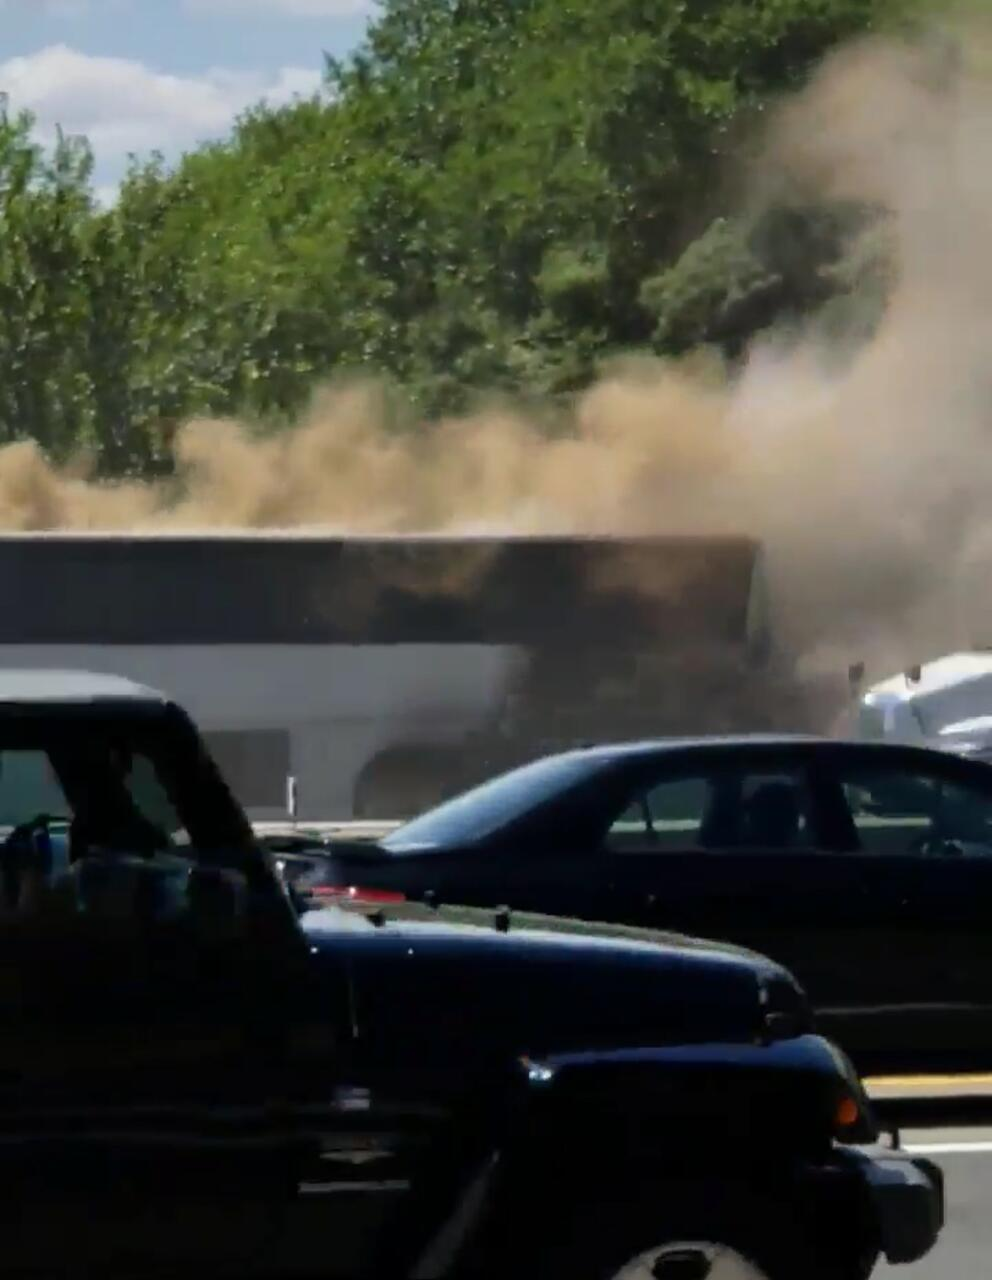 DEVELOPING FORDS/EDISON NJ: Charter Bus Fire On NJ Turnpike